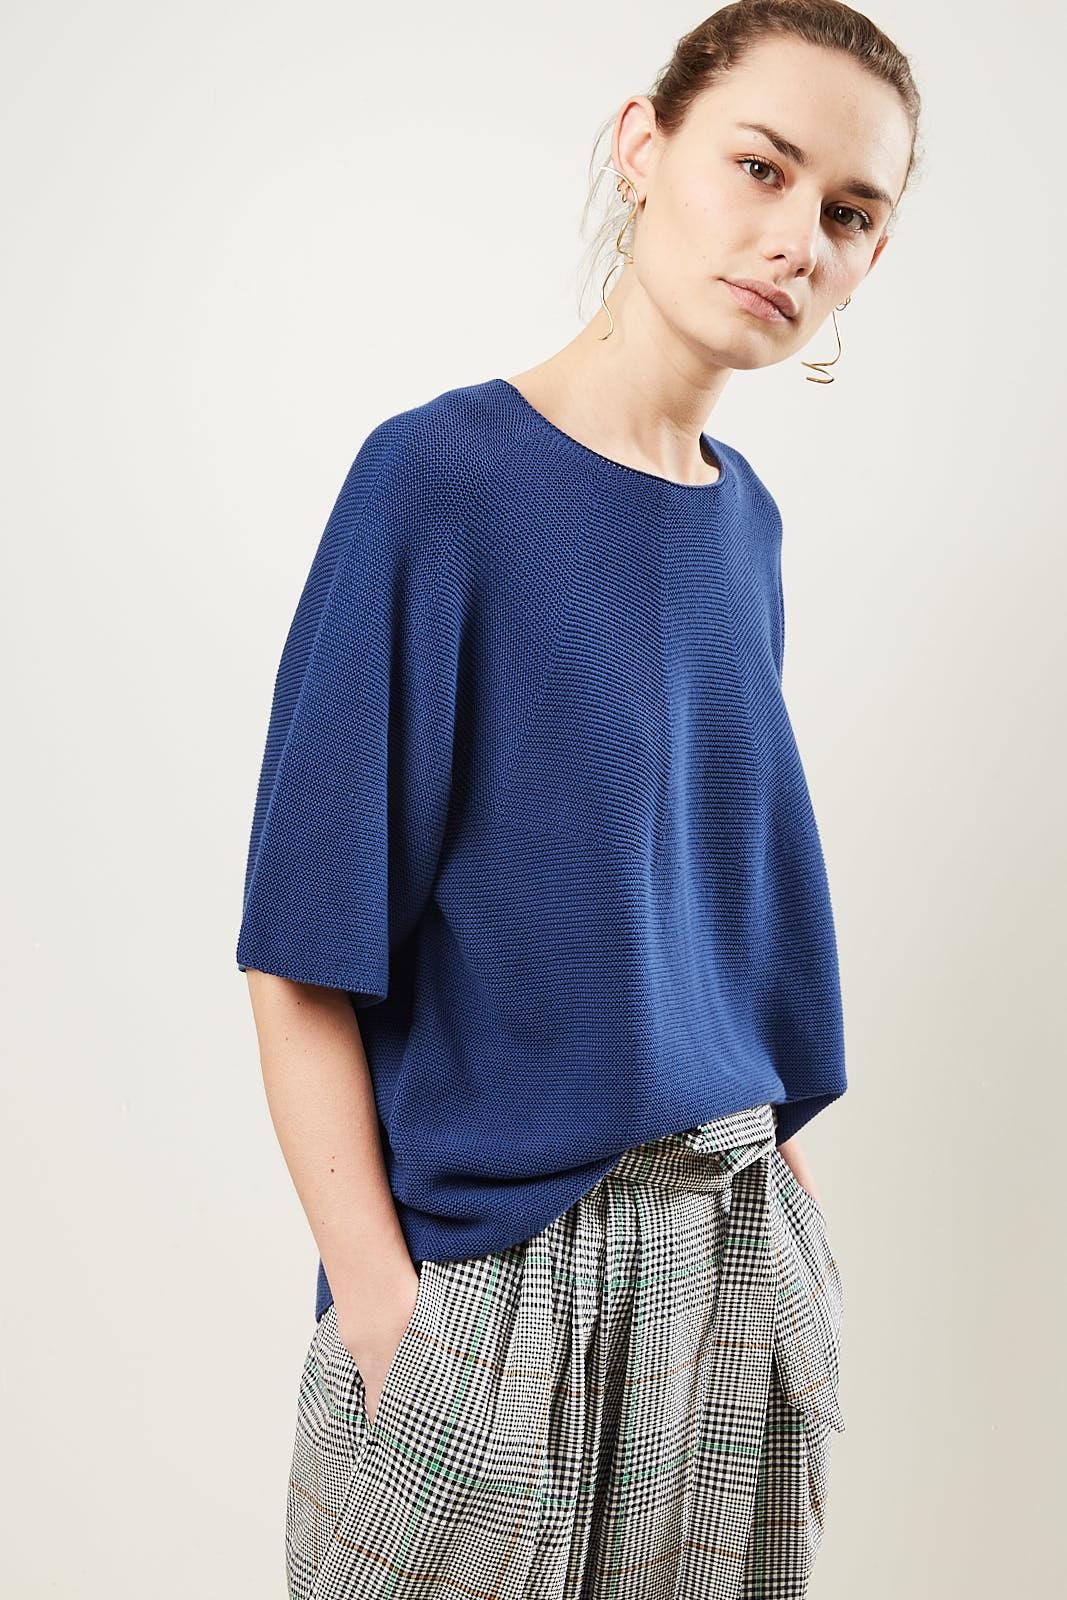 Christian Wijnants Koda knitted top indigo.